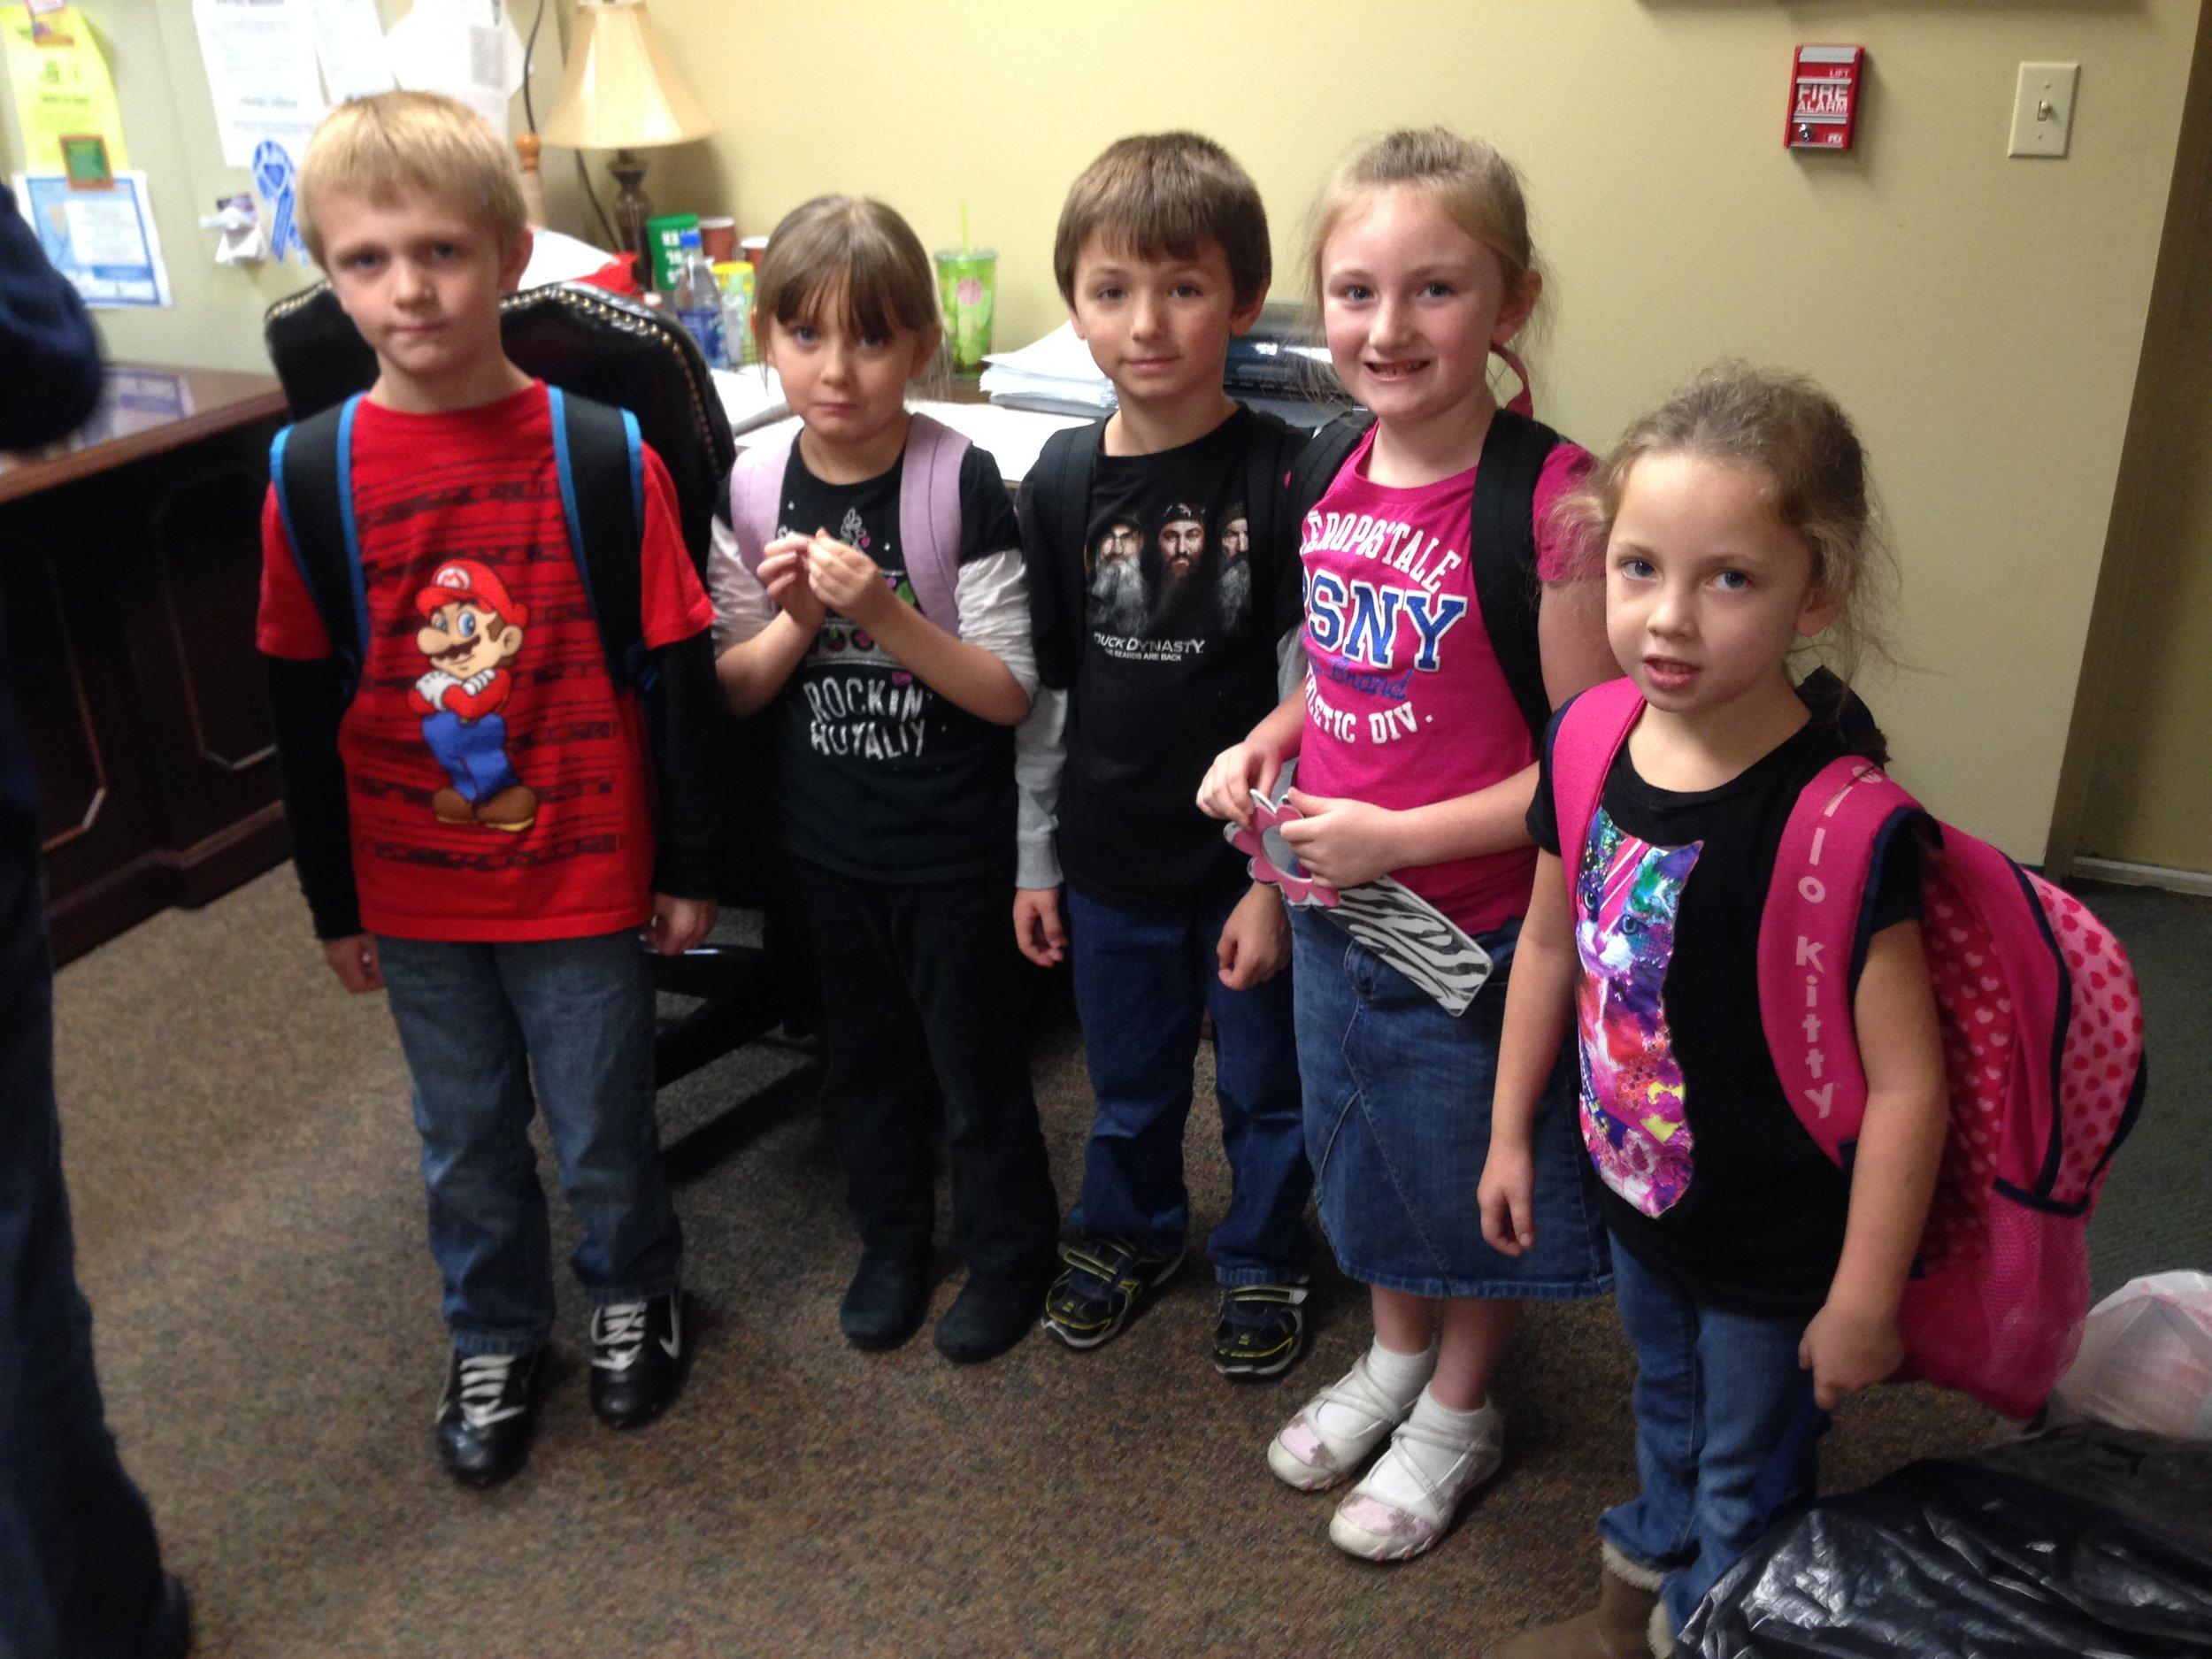 kids with backpacks.JPG